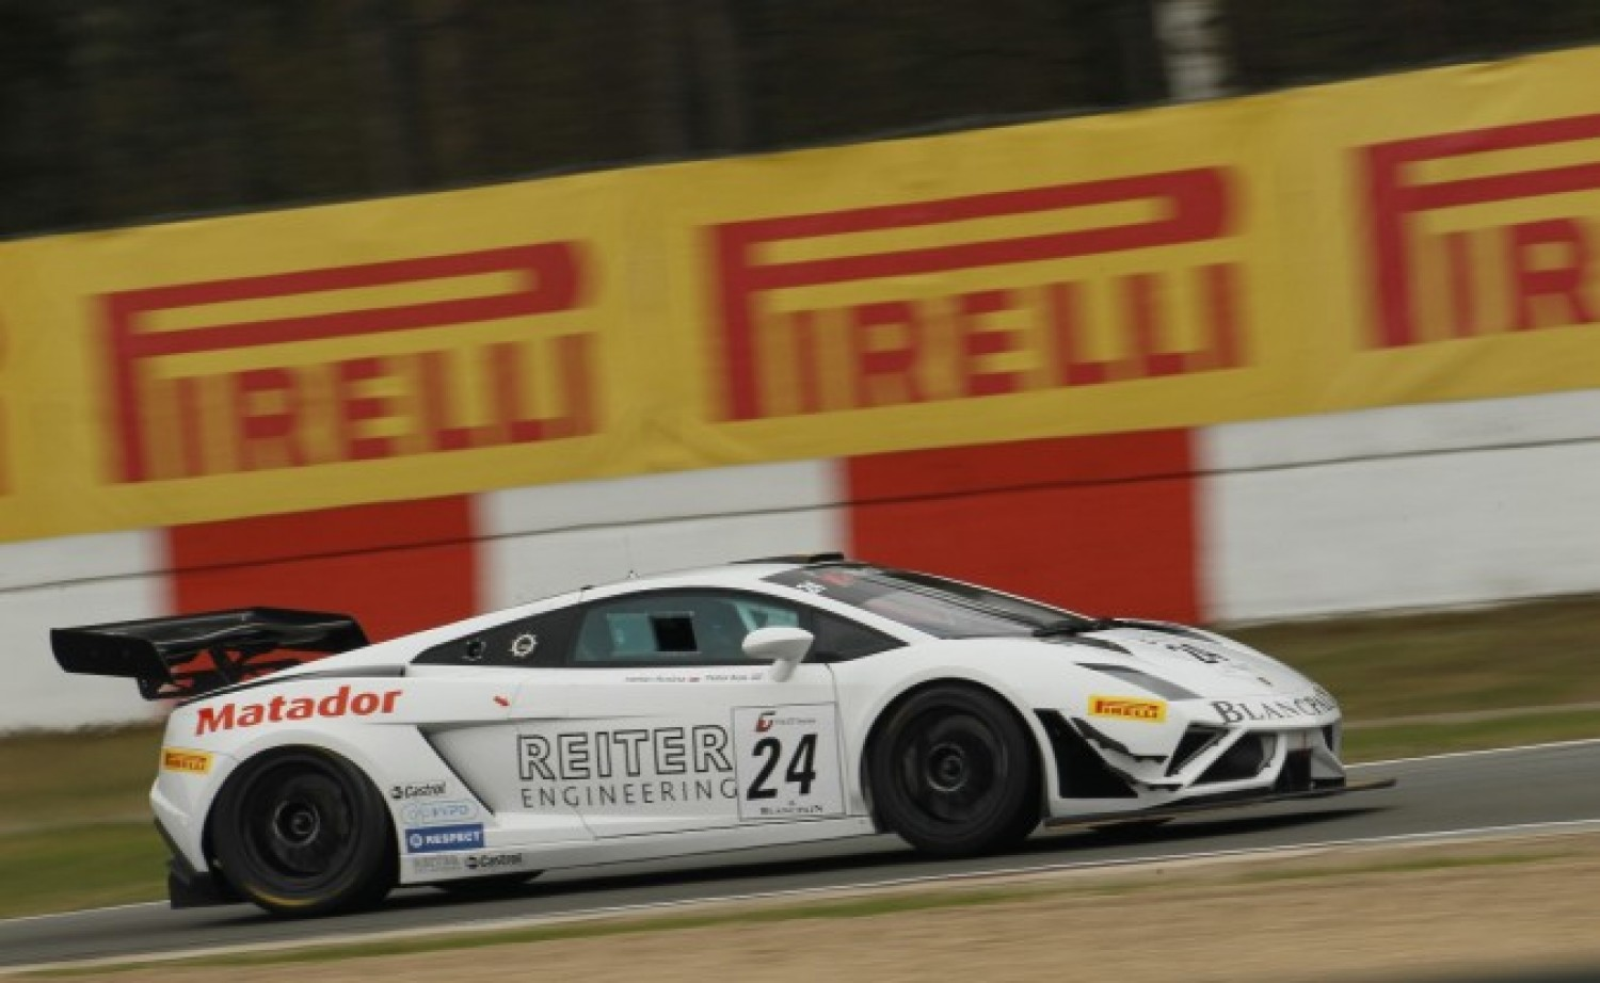 Lamborghini takes victory in sensational Zolder race